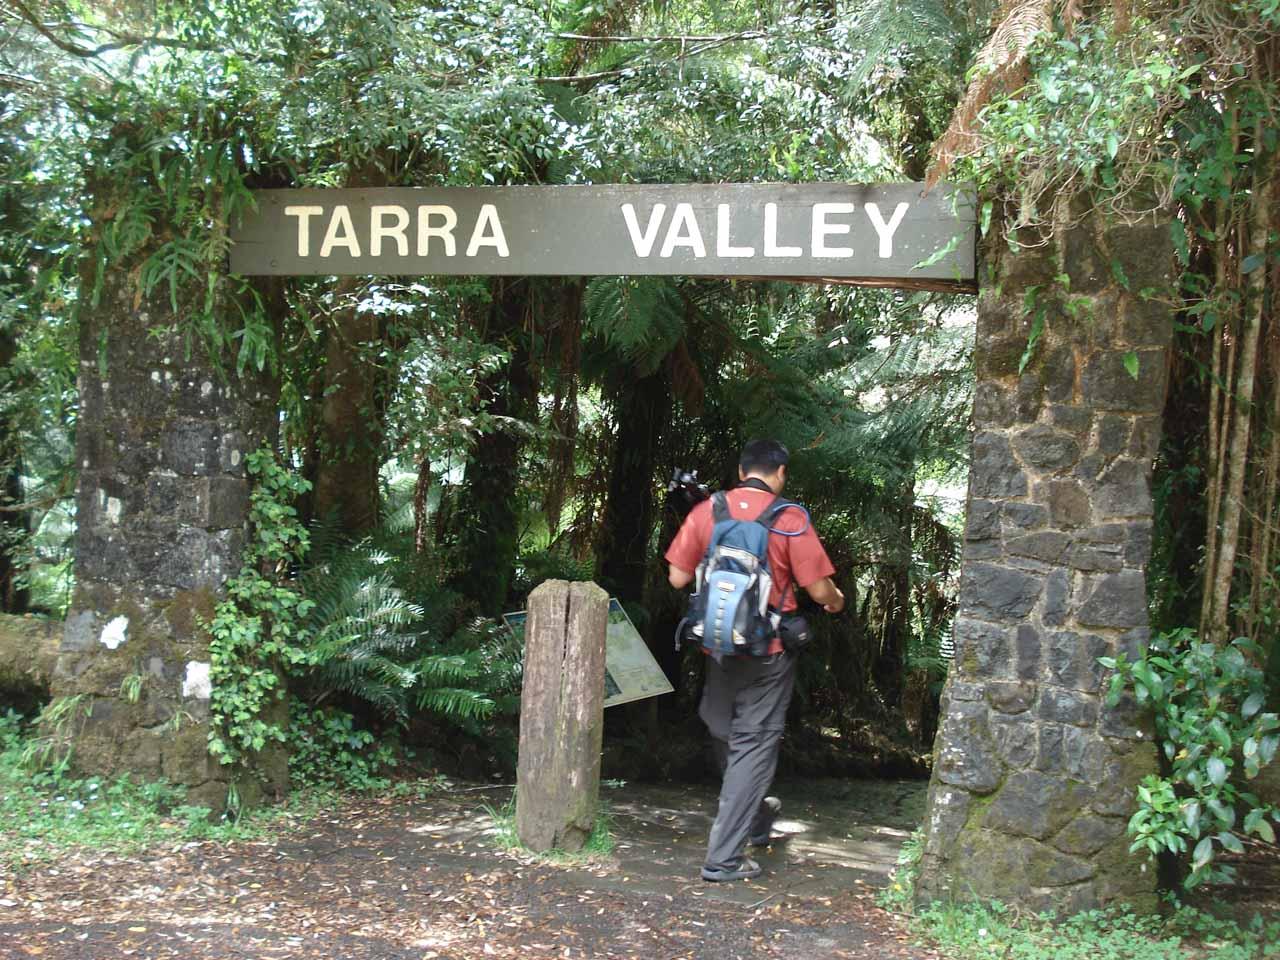 Starting the walk for Cyathea Falls